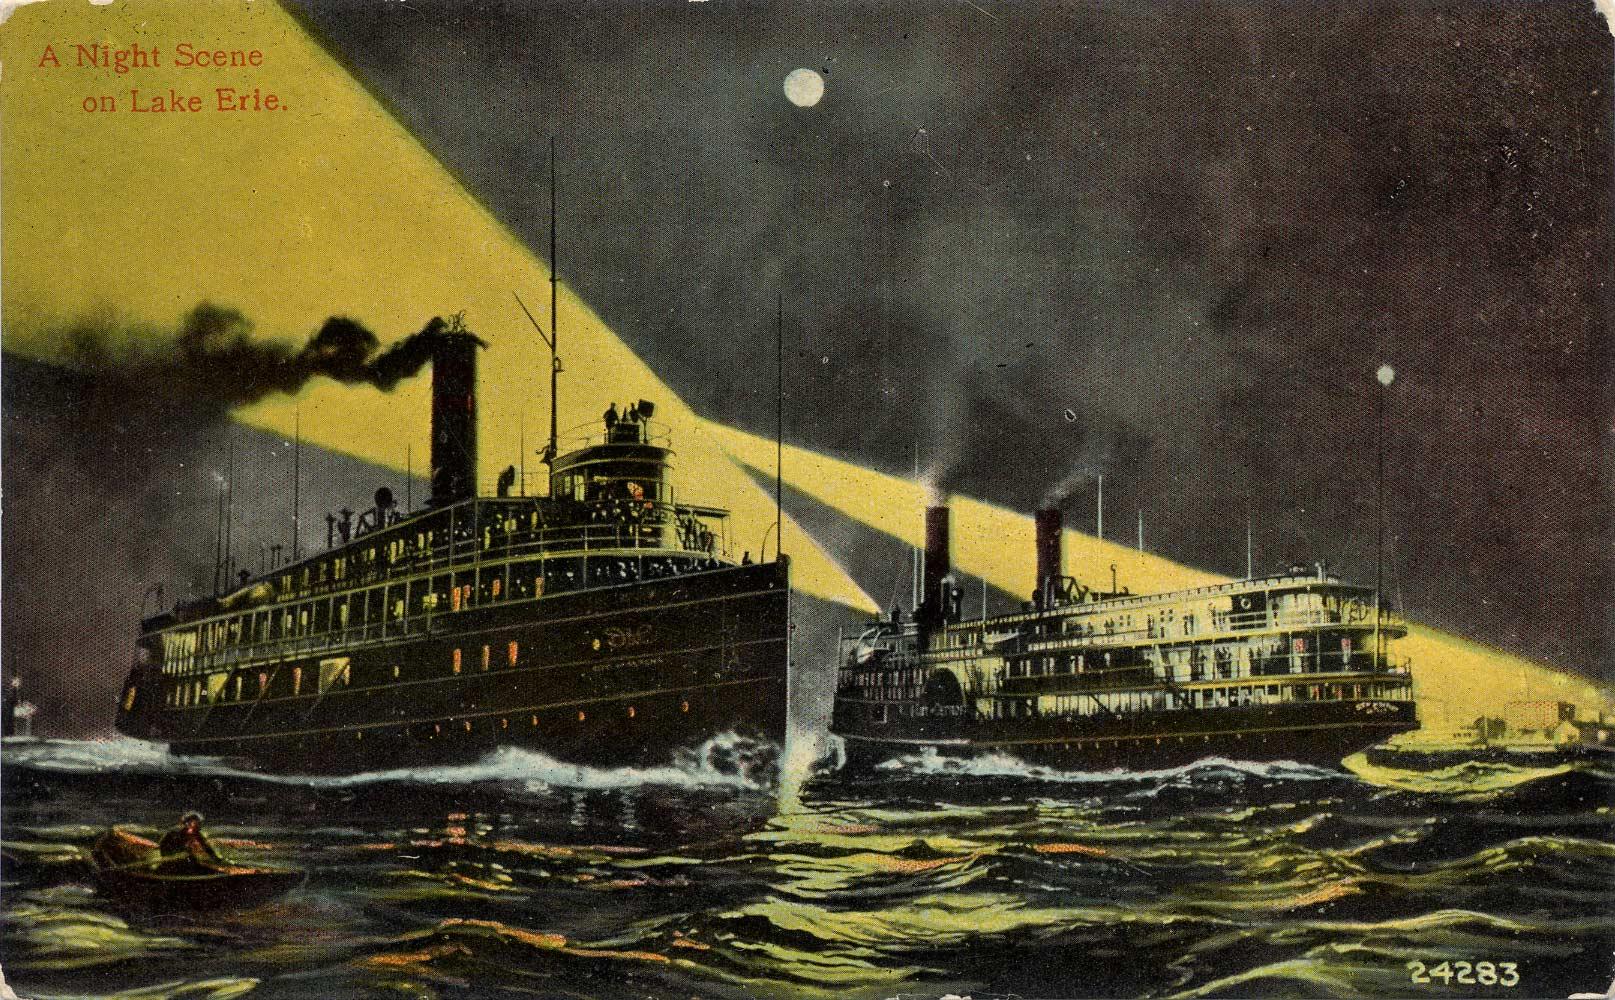 A Night Scene on Lake Erie